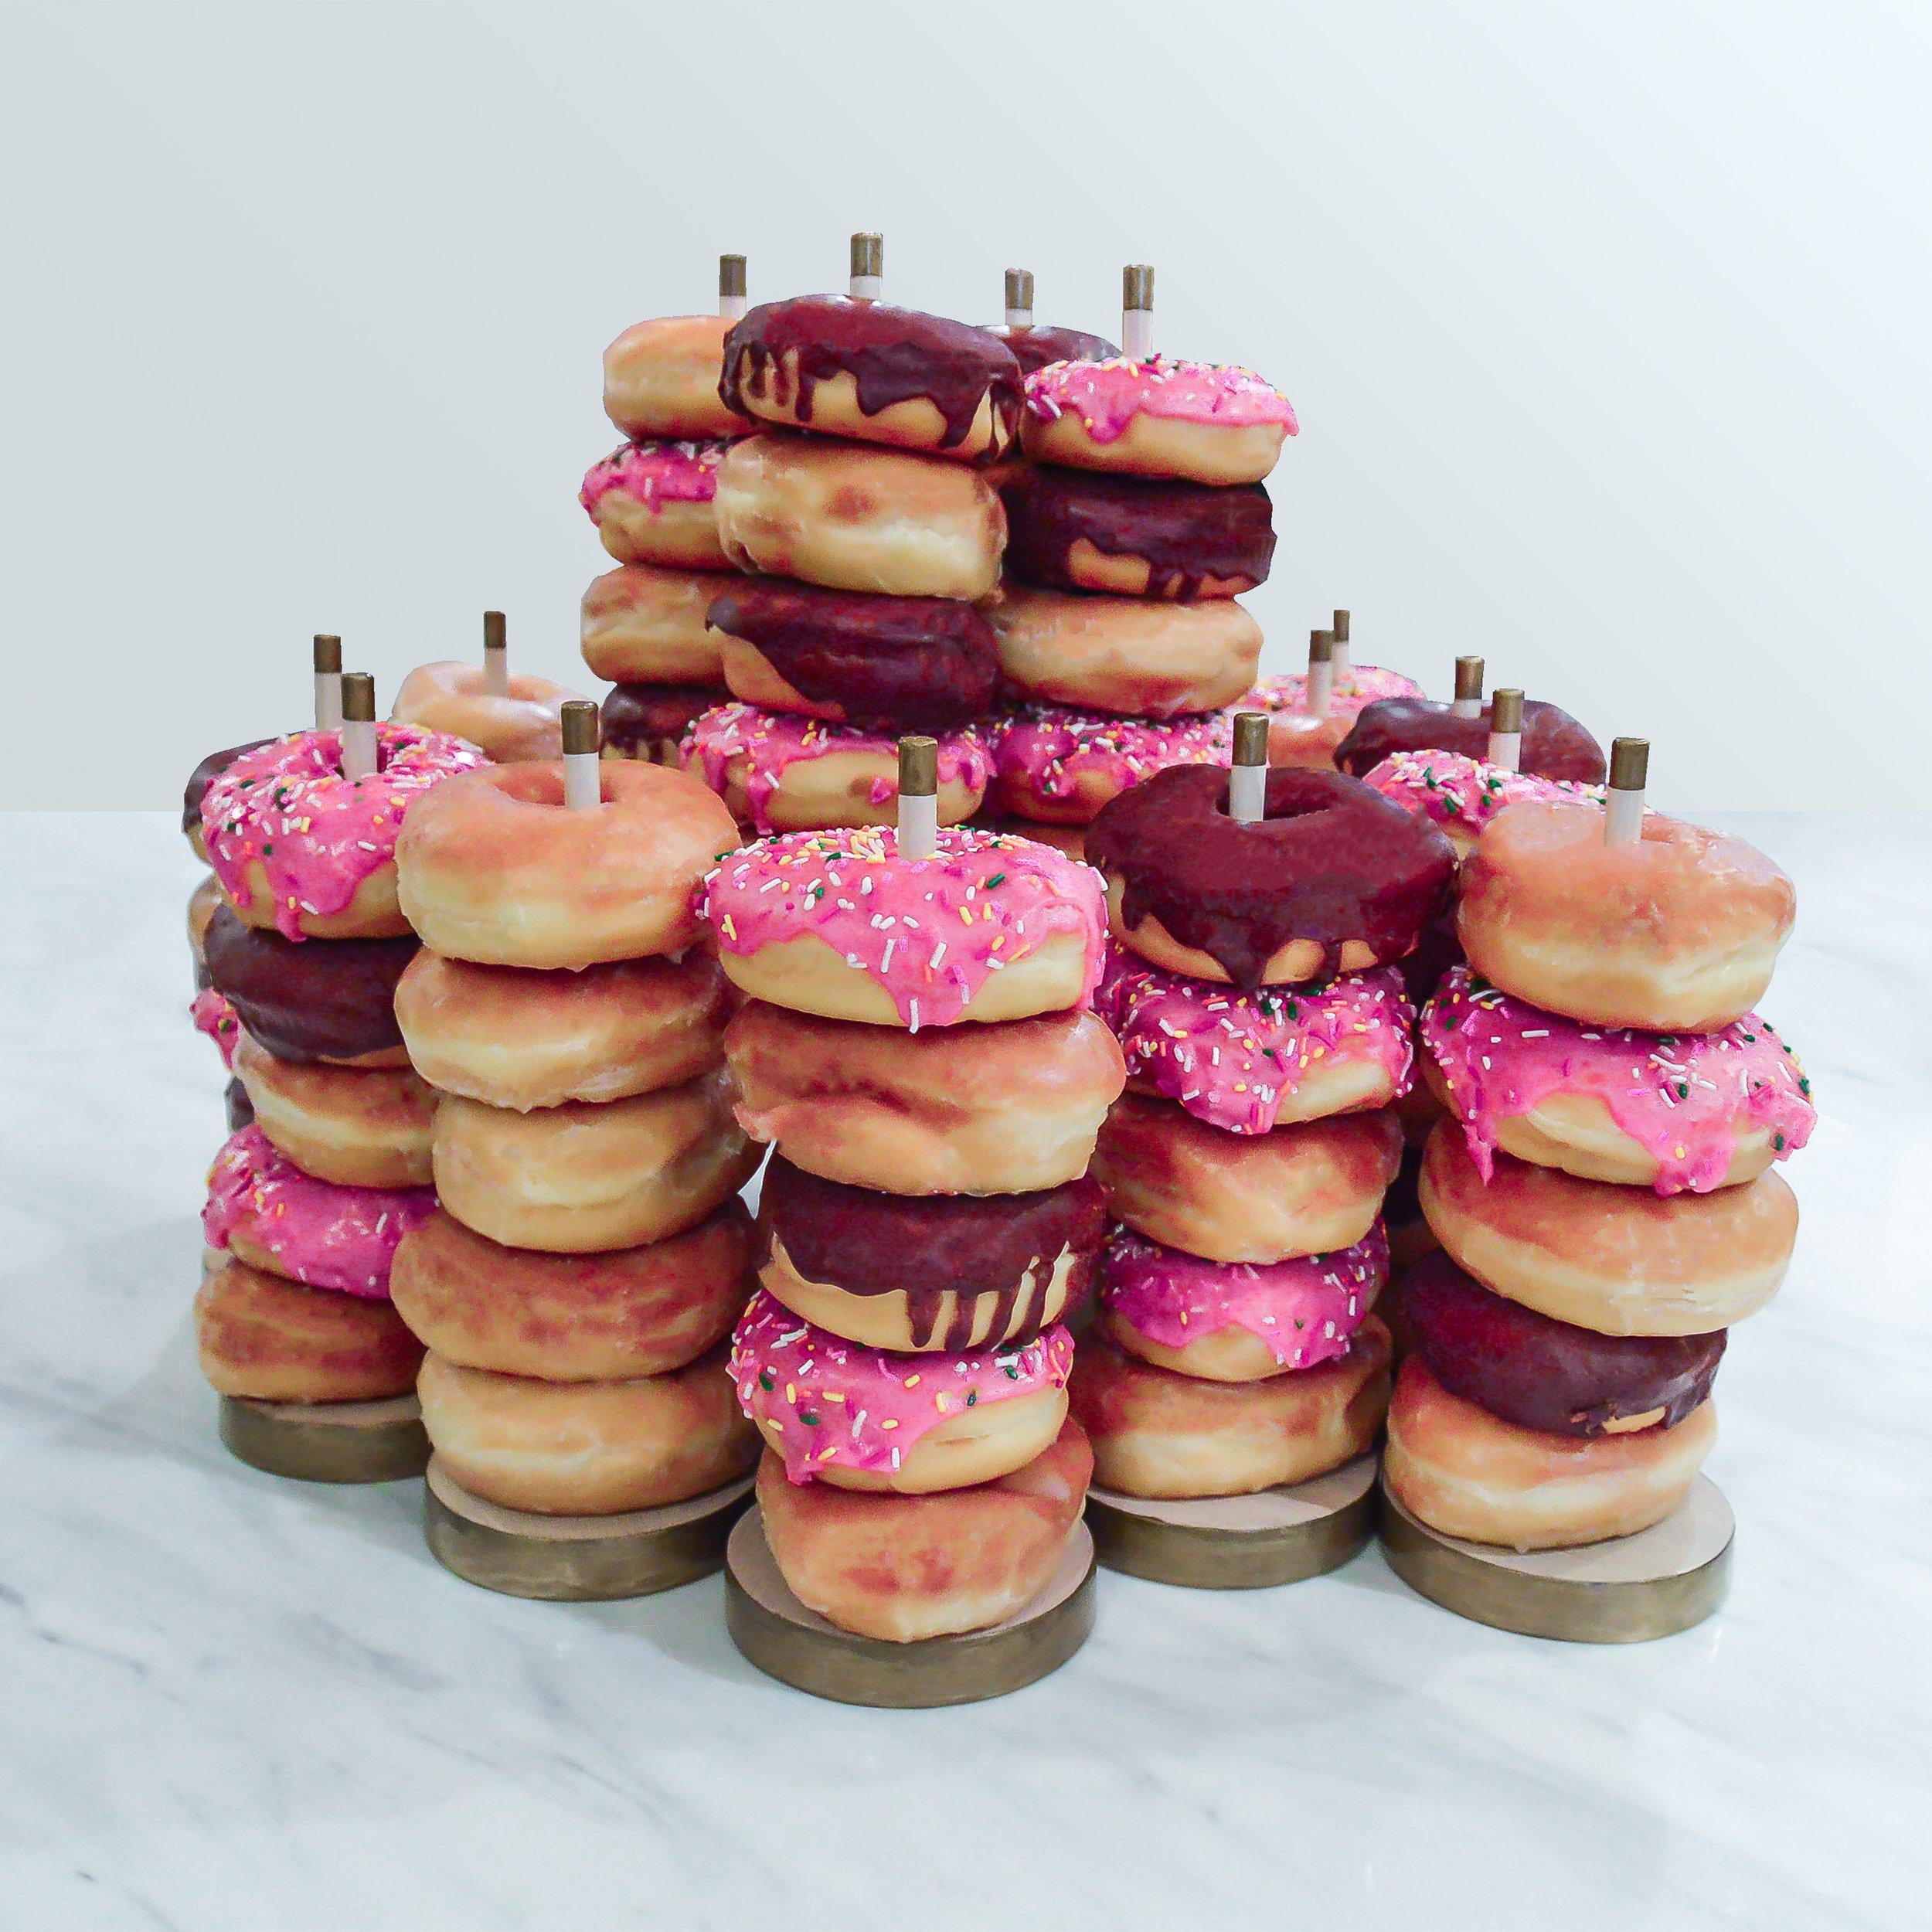 18.10.6_Donut Stand-3.jpg